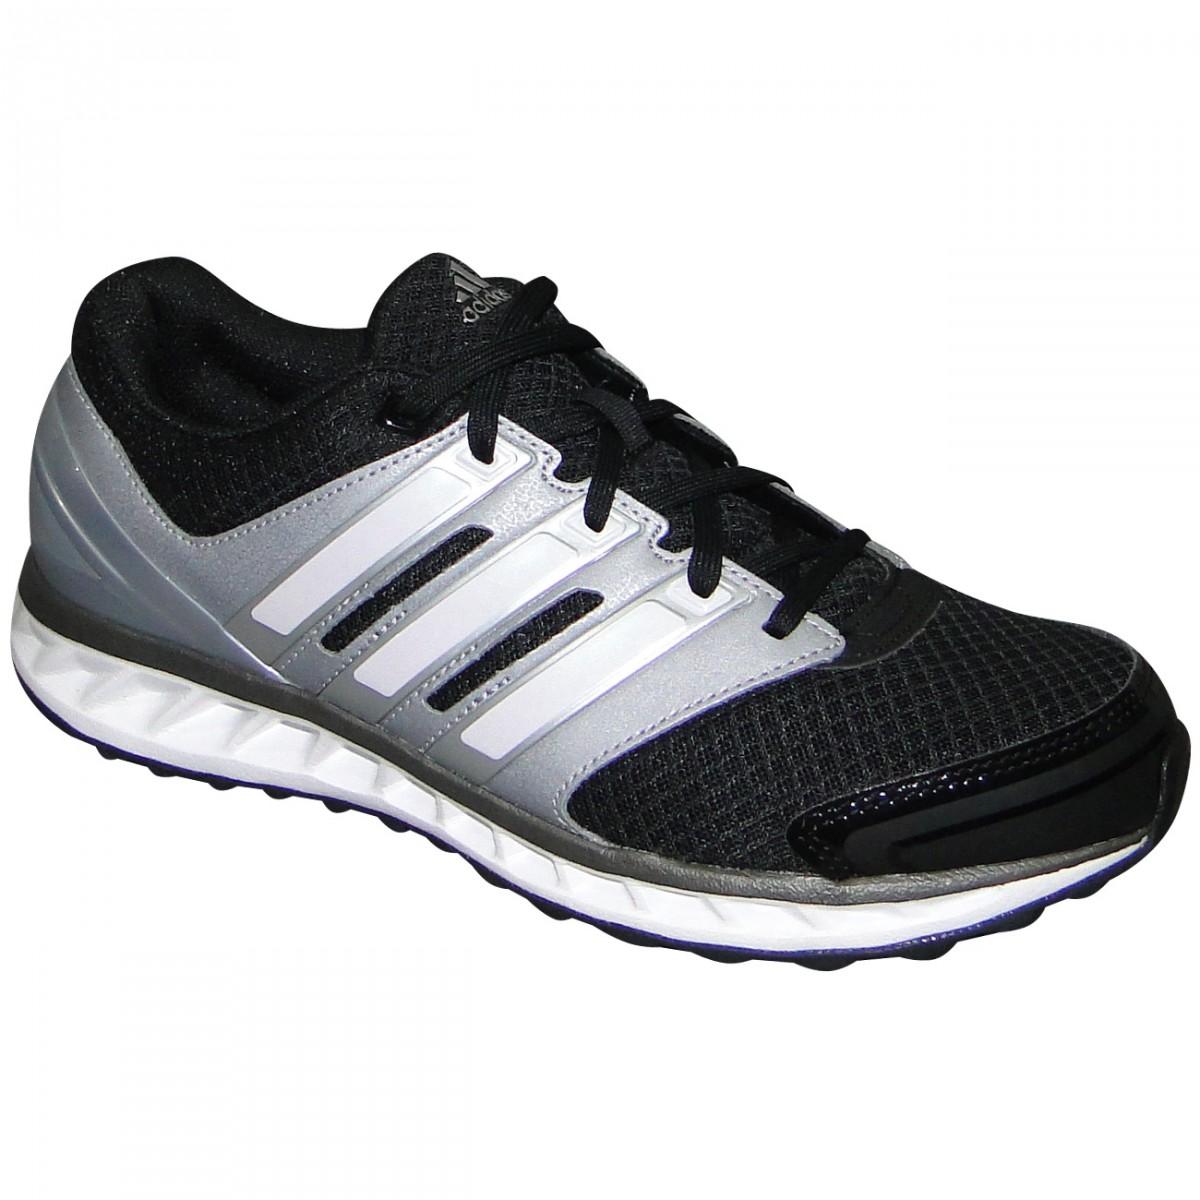 f64a0f57e43 Tenis Adidas Falcon Elite 3 D67156 - Preto Prata - Chuteira Nike ...